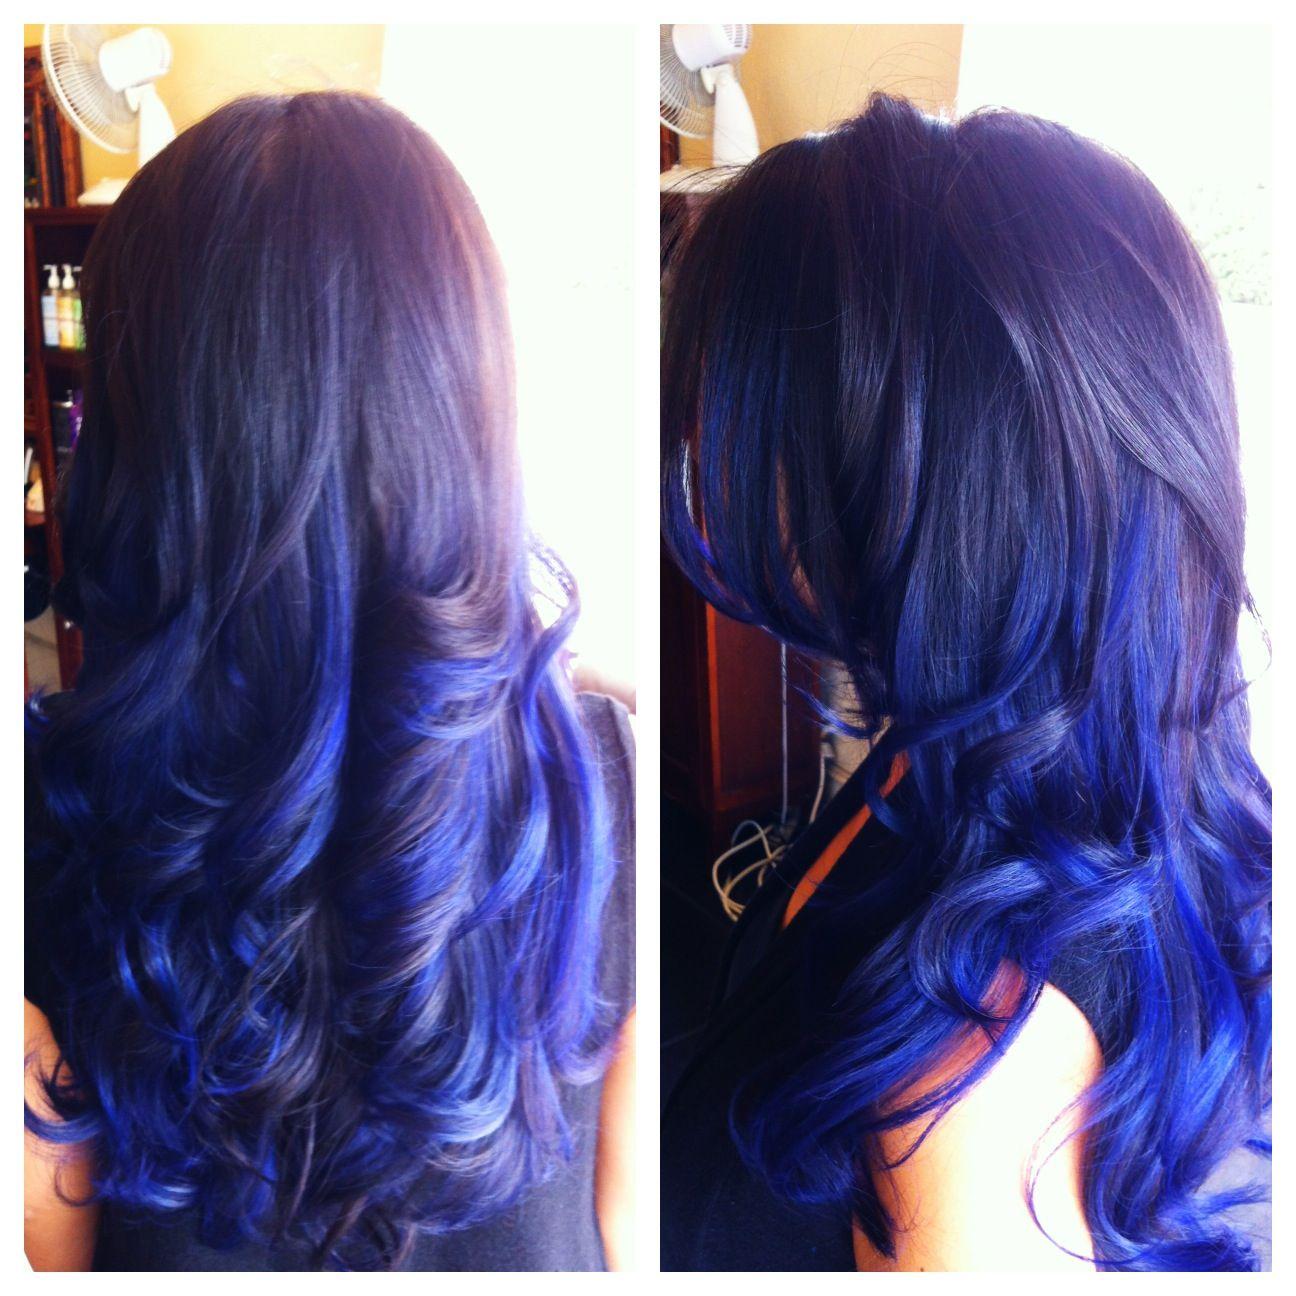 #blueombre blue ombré hair by Erica @Tina Giger Ink #salonink www.salonink.com